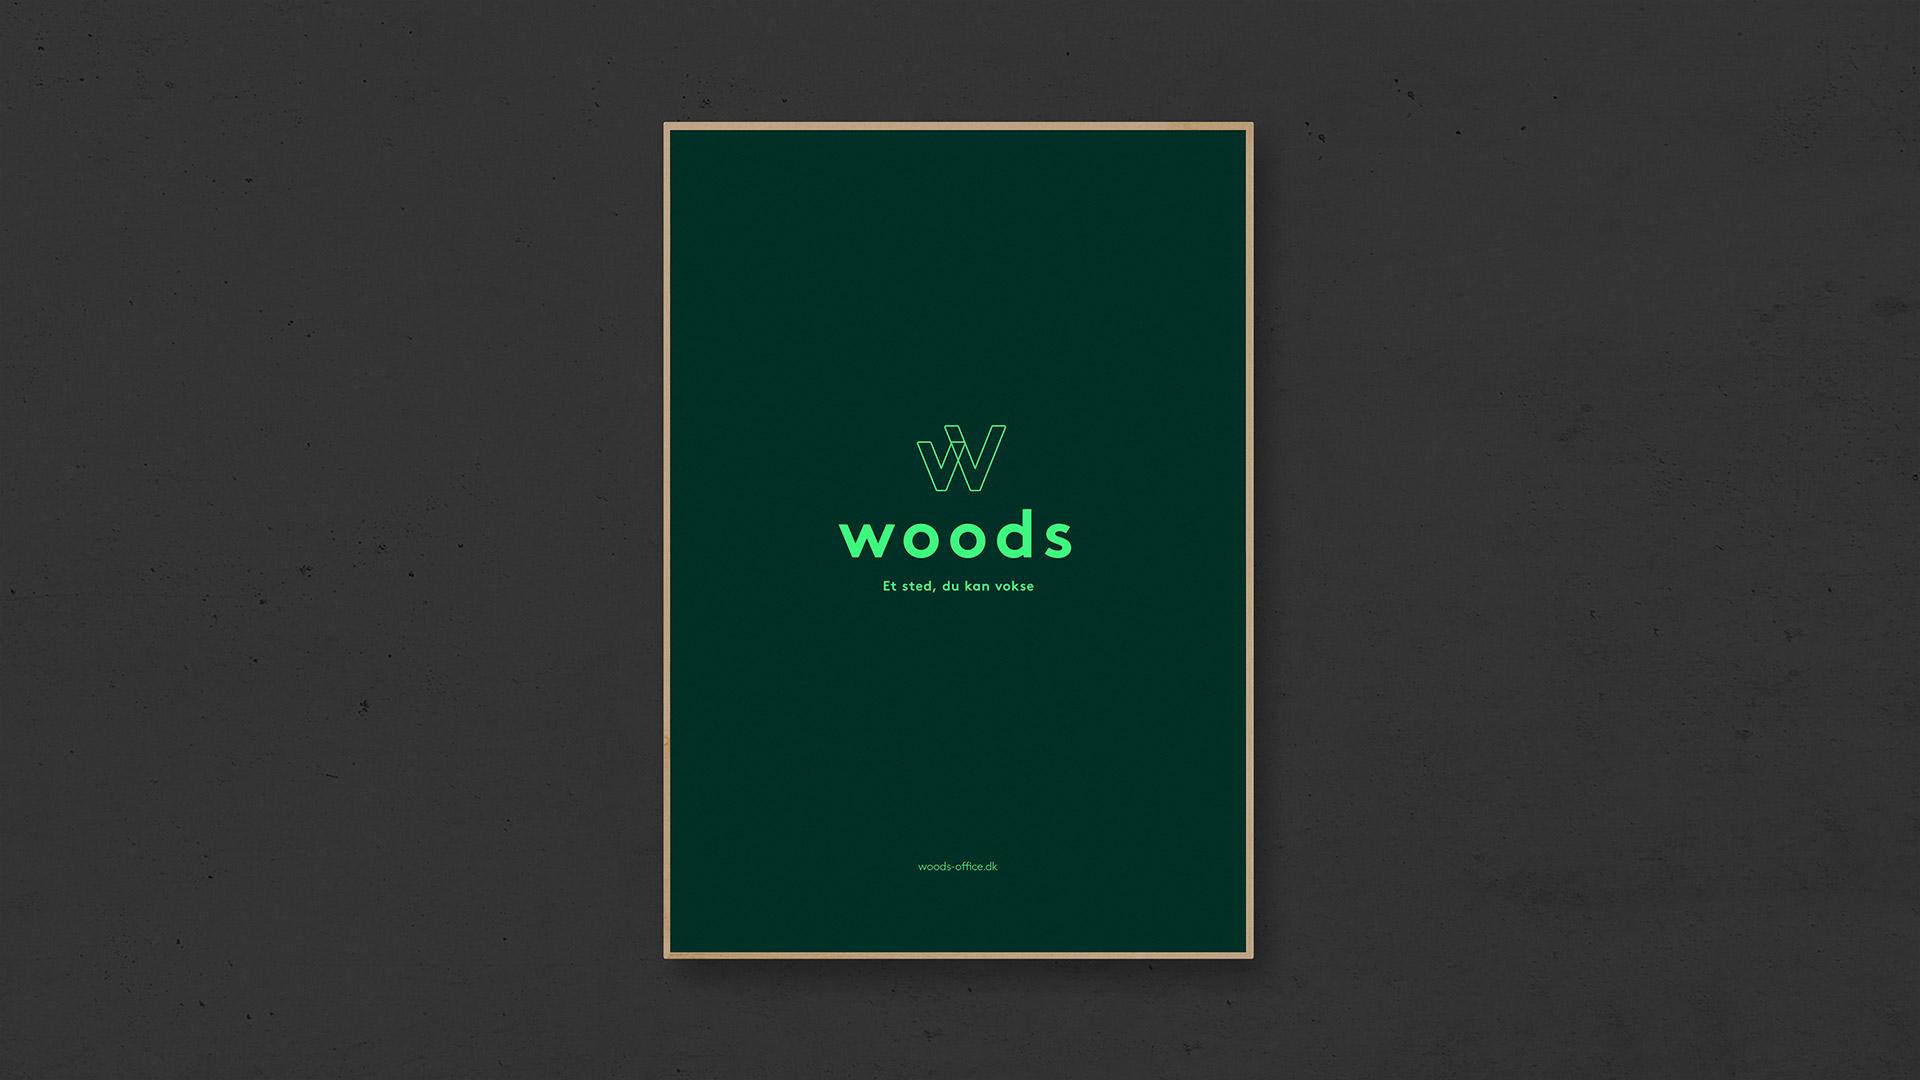 Tetris - Woods - Kampagne - Plakat